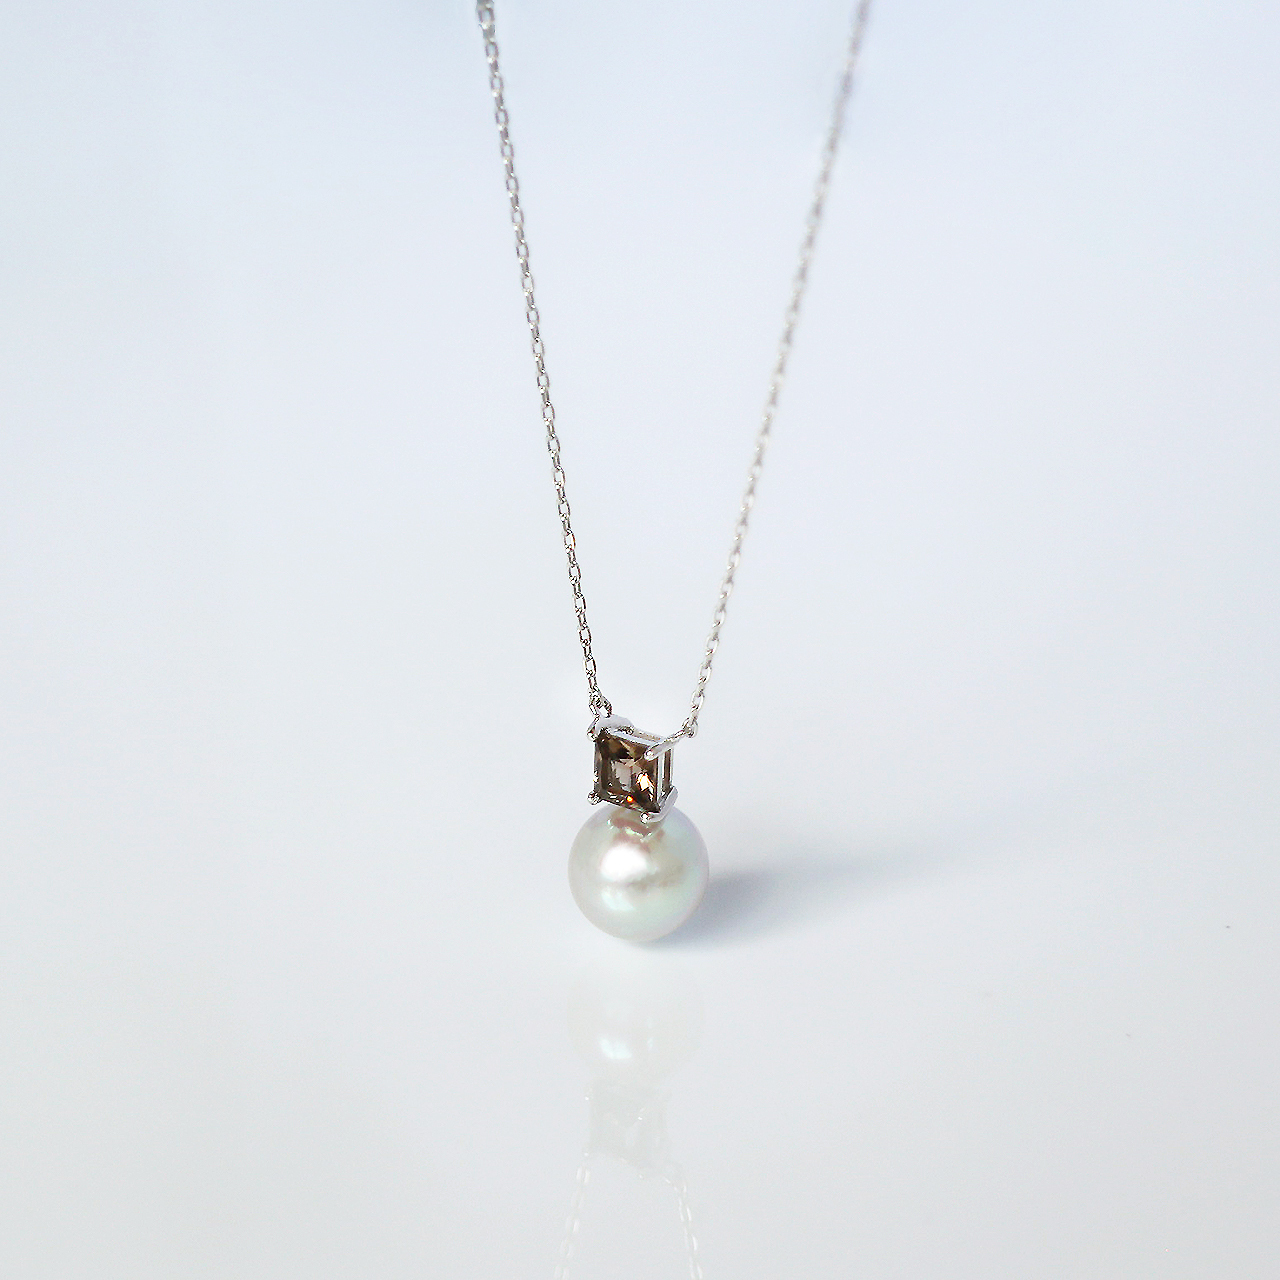 ELEMENTS / Necklace (Grey)